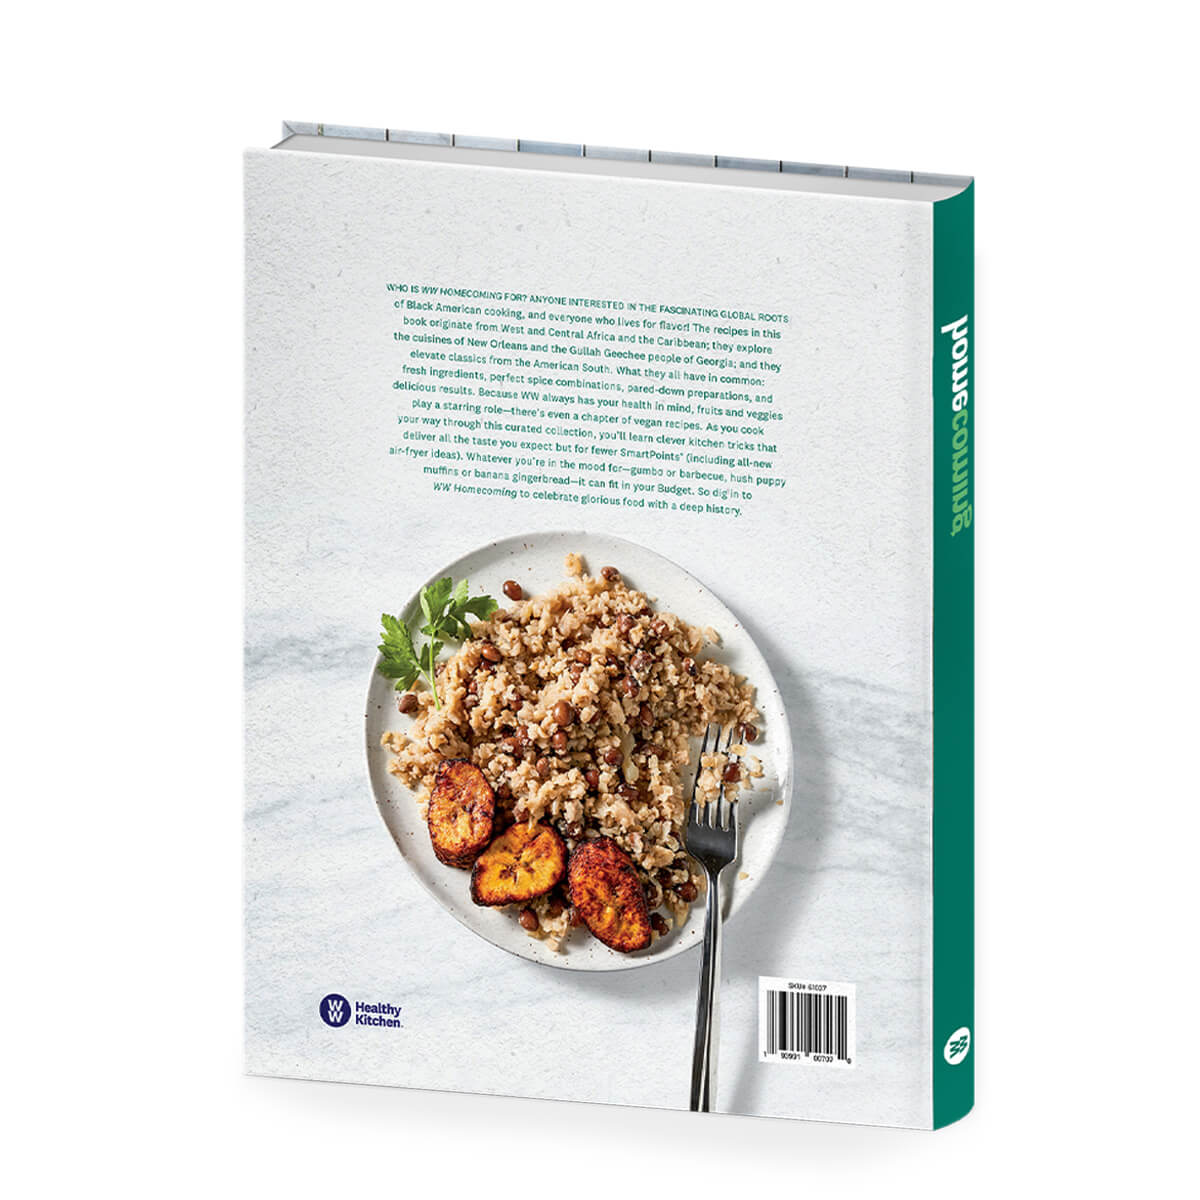 Homecoming Cookbook - back